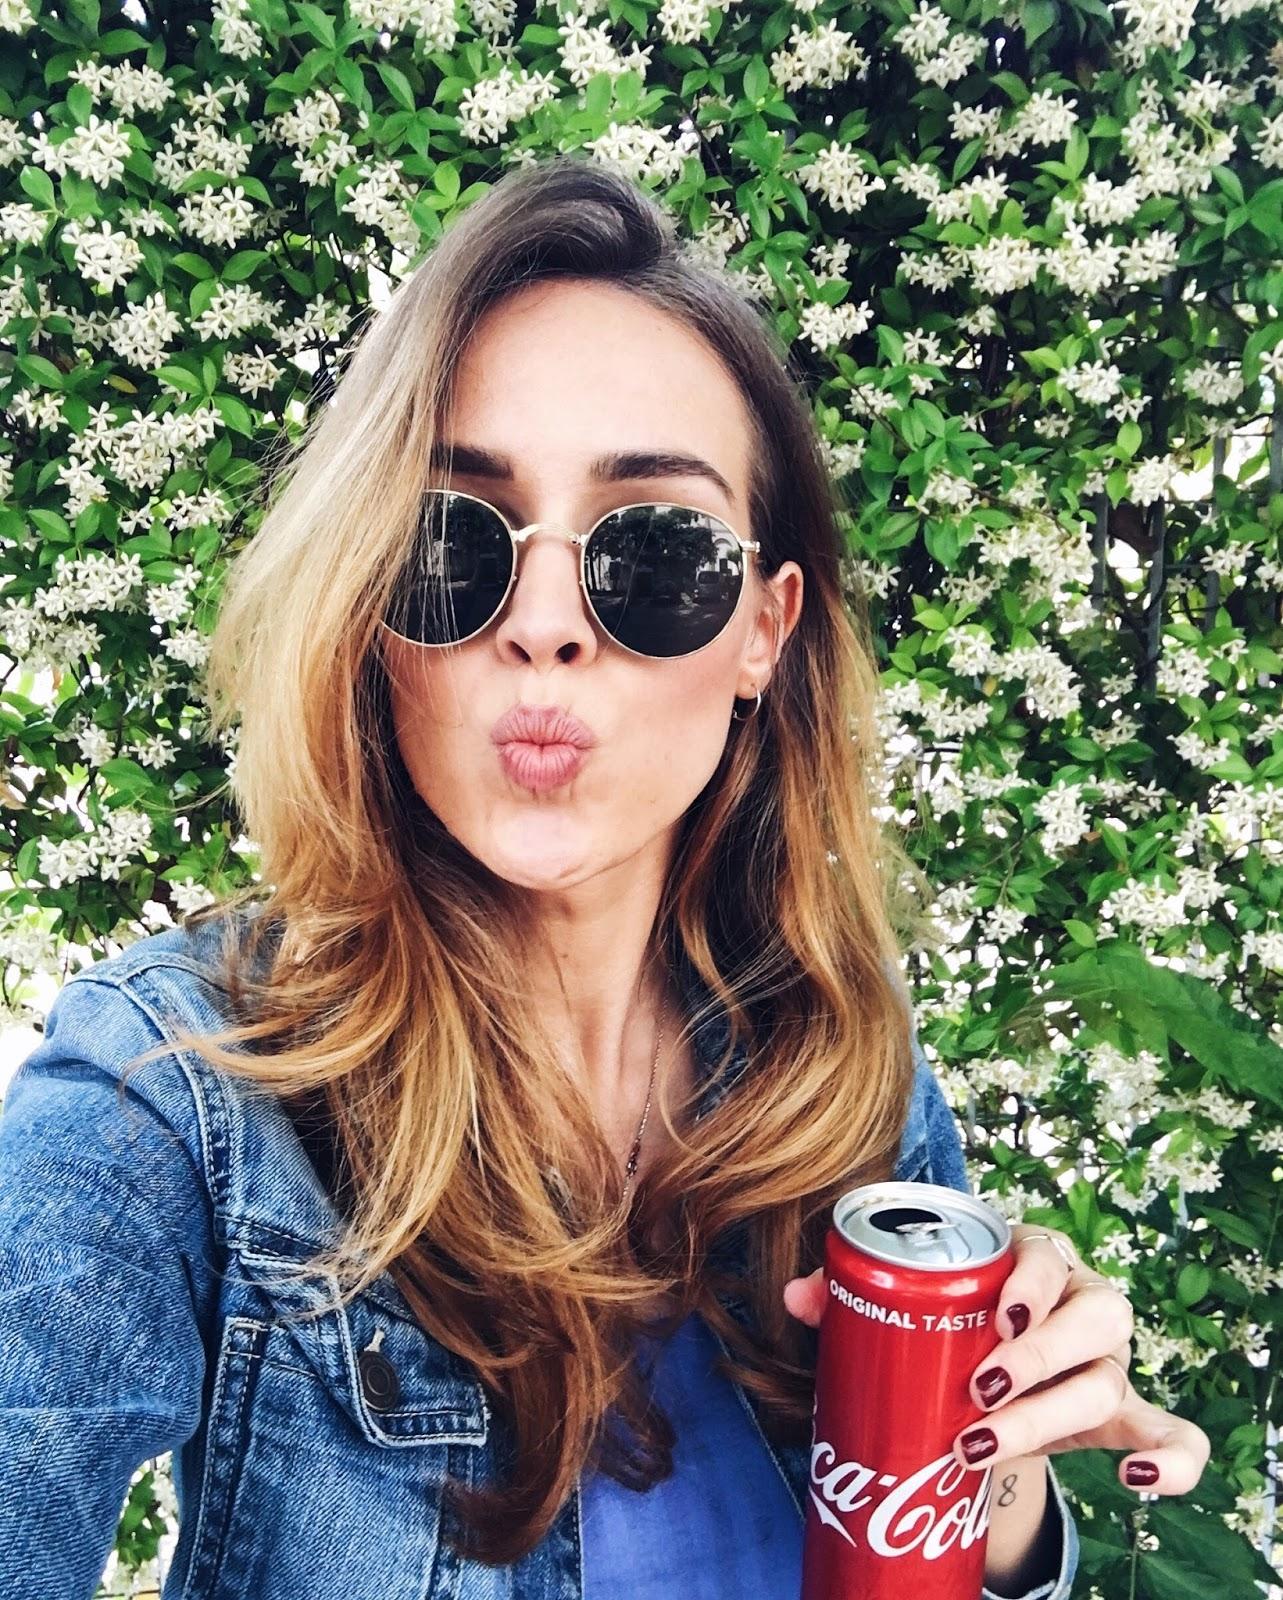 ray ban round folding sunglasses coca cola can